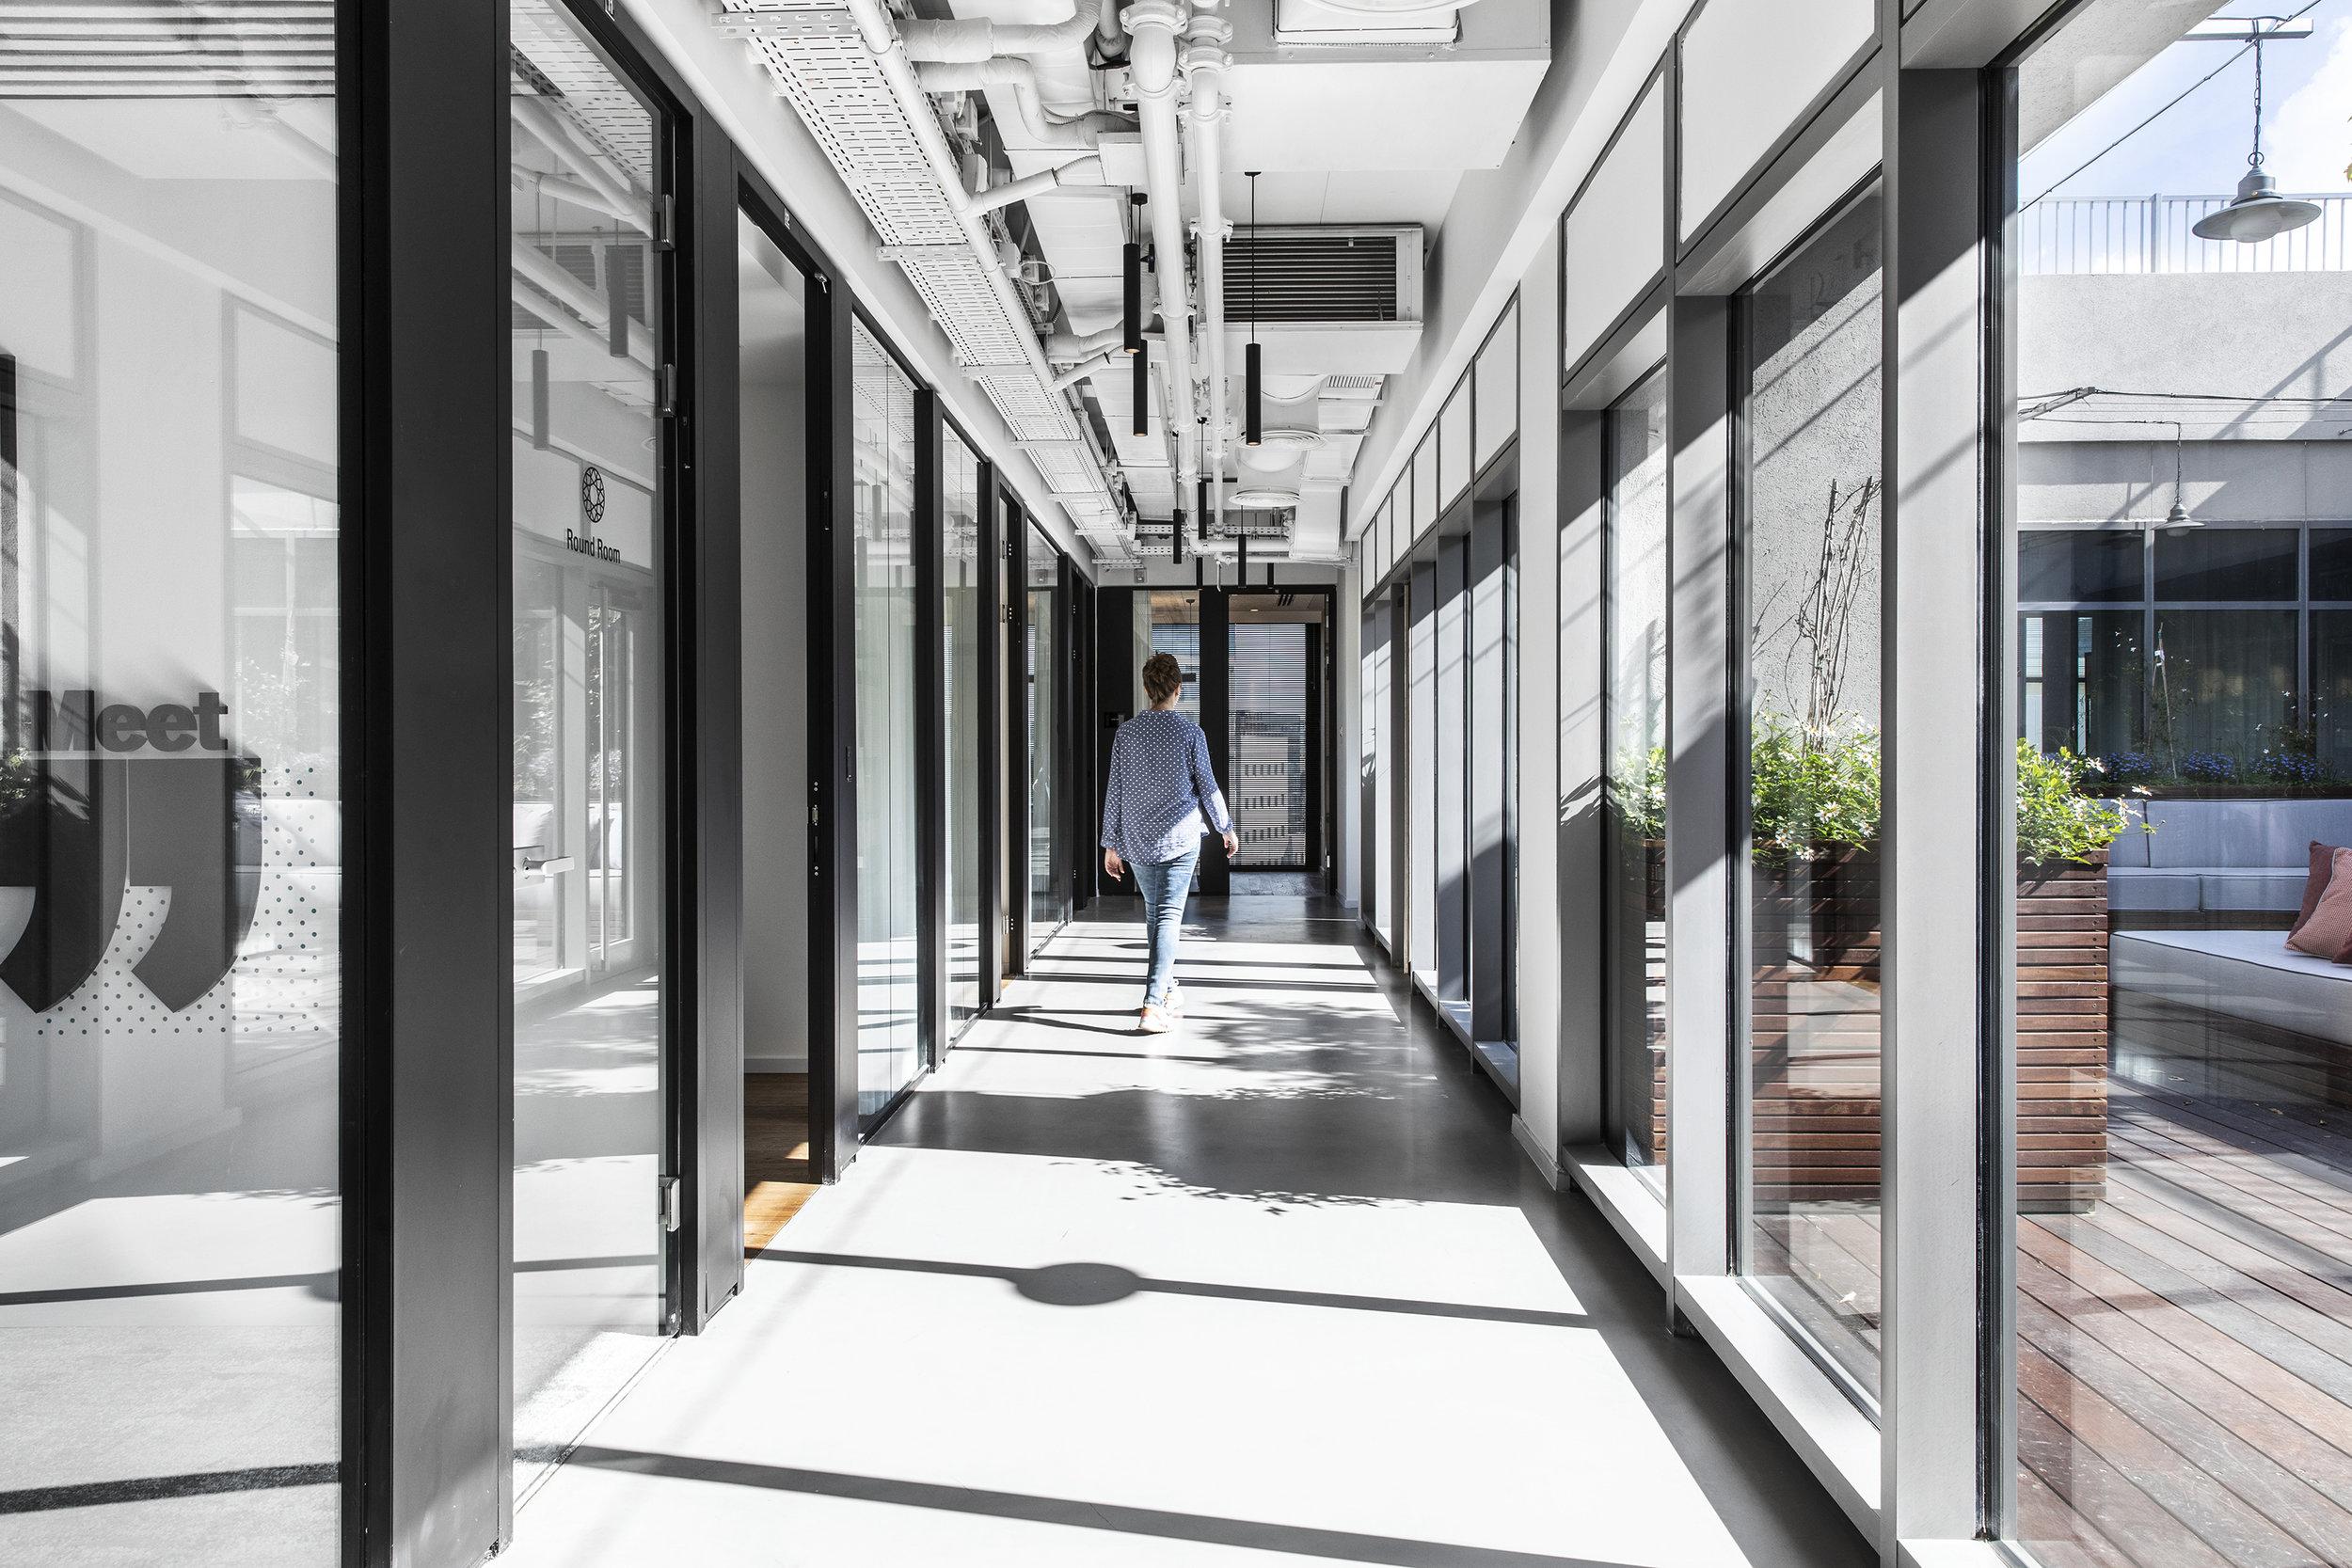 R2NET OFFICES - ROY DAVID ARCHITECTURE  STUDIO - רואי דוד אדריכלות סטודיו אדריכלים - אר2נט (3).jpg